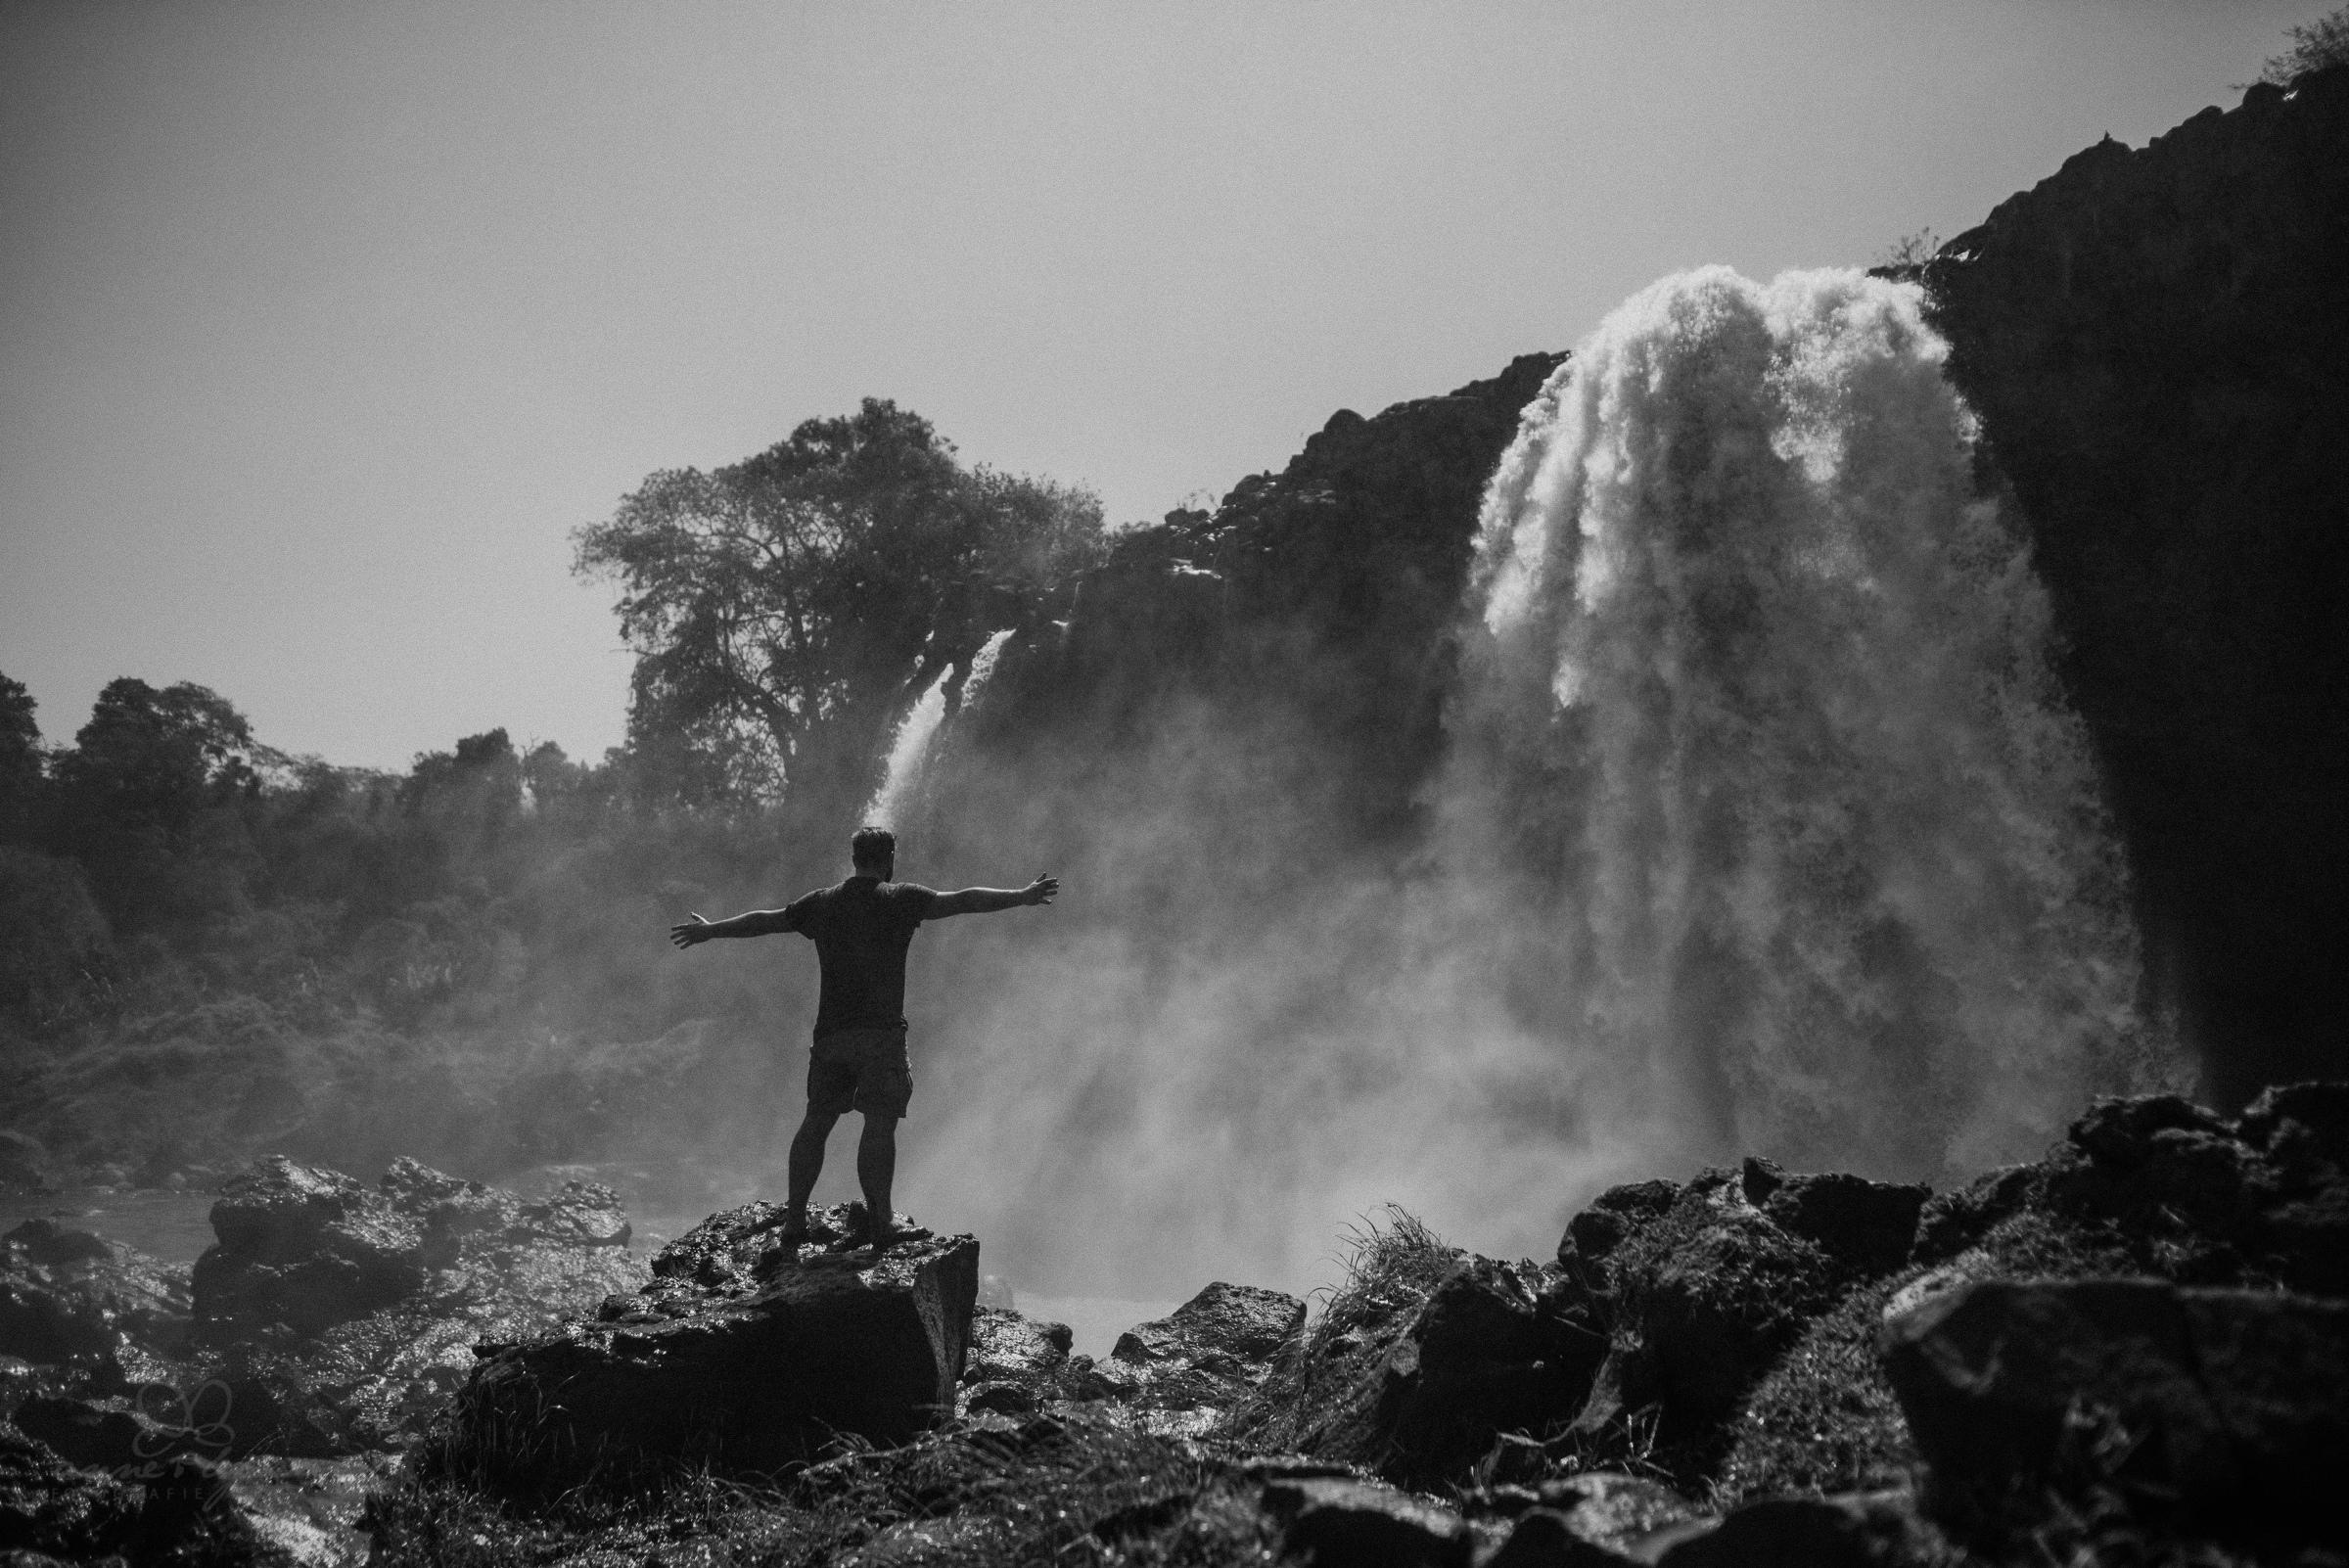 Wasserfall, Bahir Dar, Bahia Dar, Portrait, Abenteuerlust